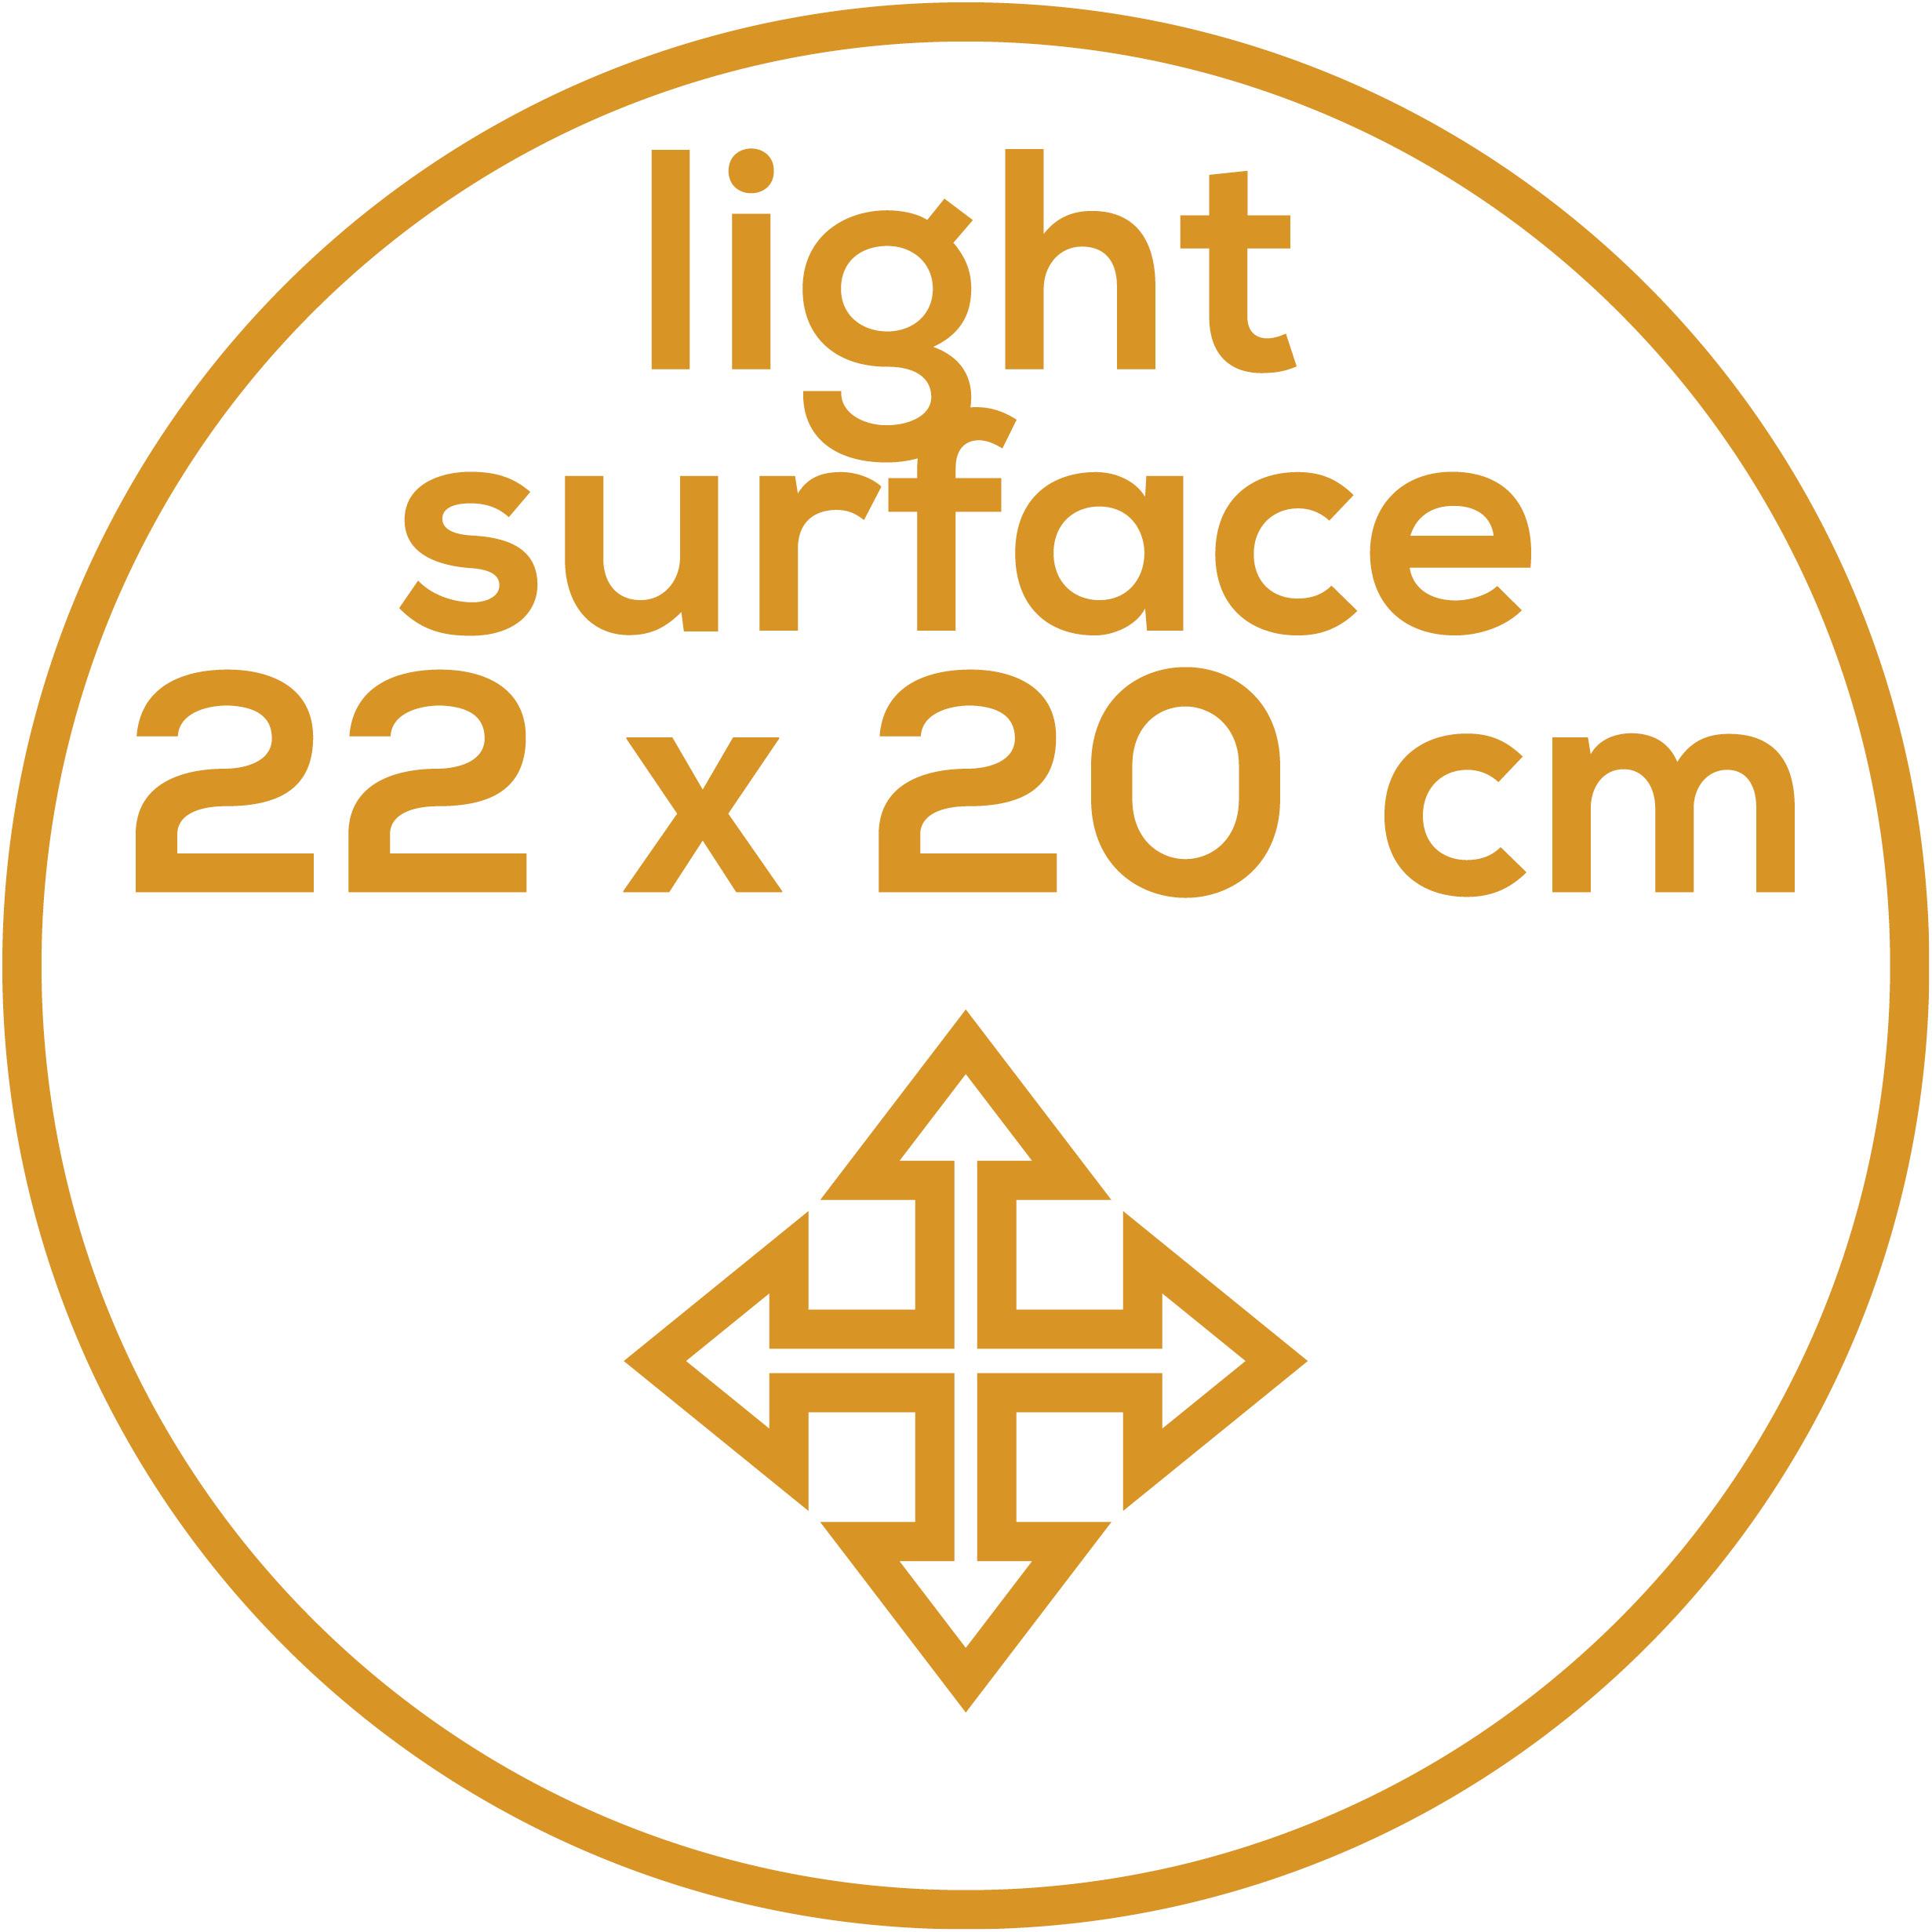 Superficie de iluminación 22 x 20 cm